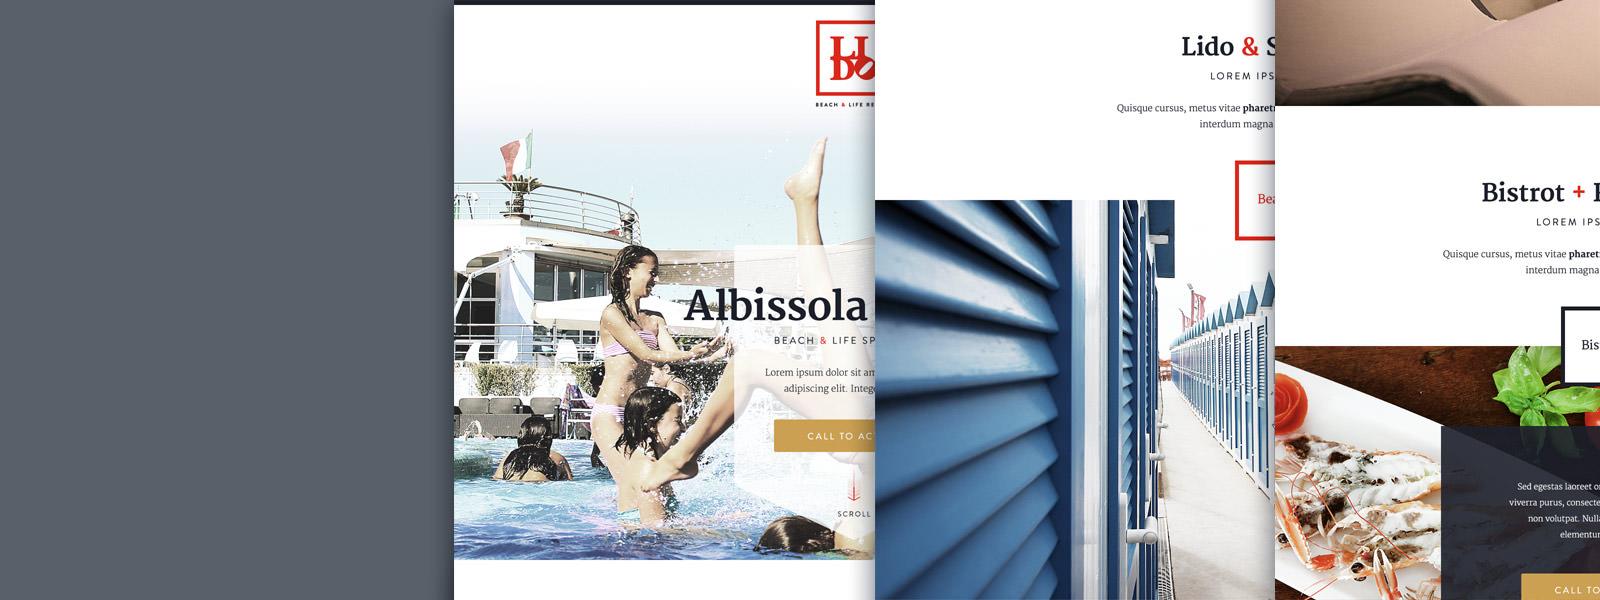 Muse Comunicazione - Lido Beach&Life Resort Brand e Web Redesign